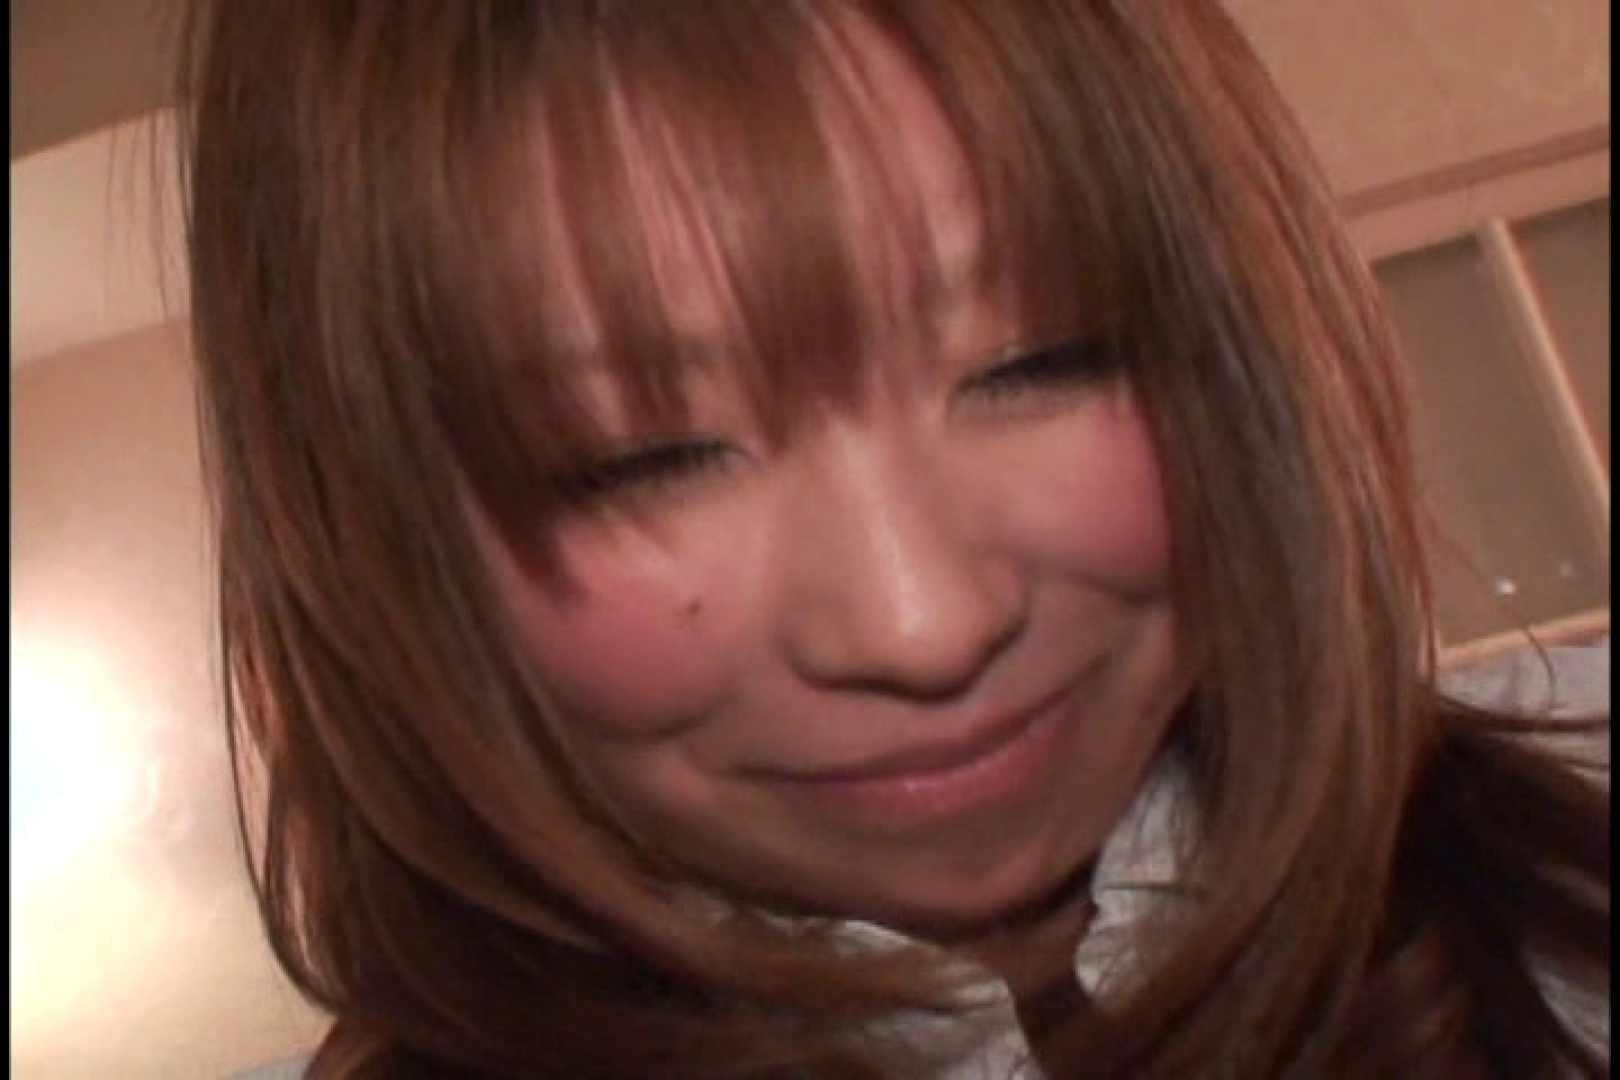 JDハンター全国ツアー vol.014 前編 女子大生のエロ動画 | 0  104PIX 57